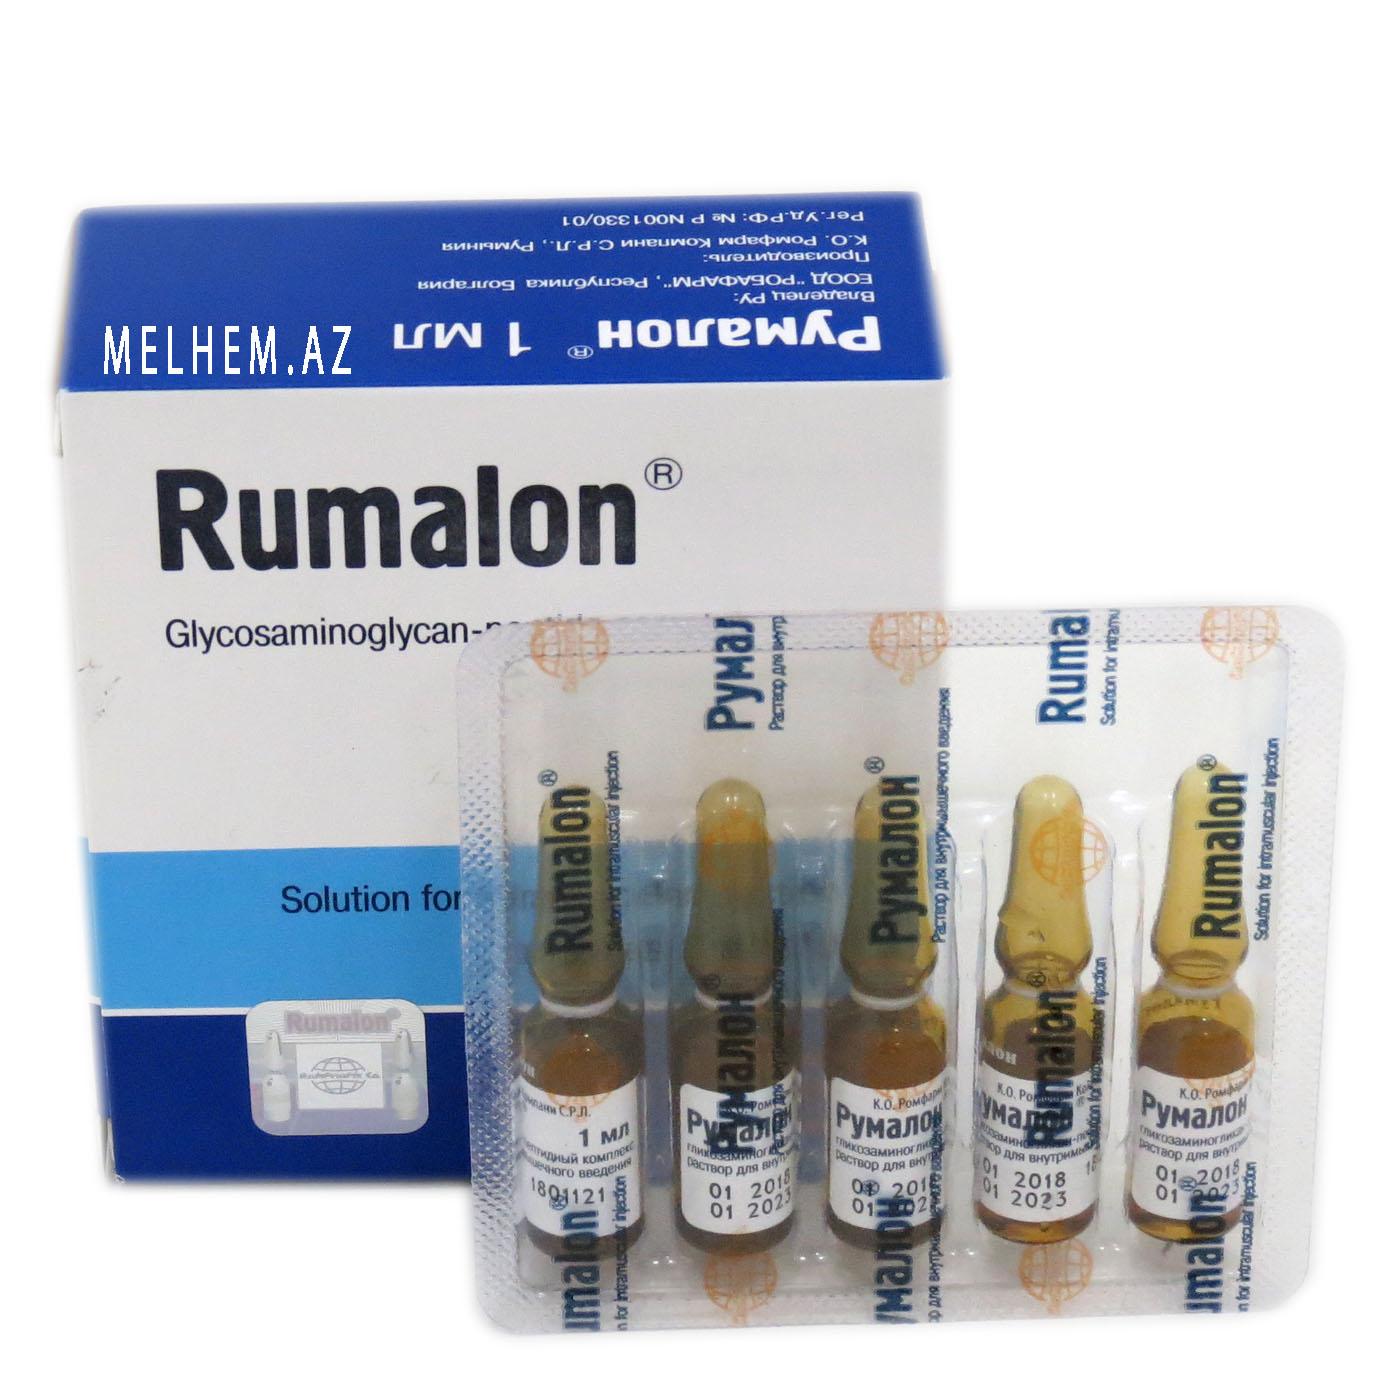 RUMALON